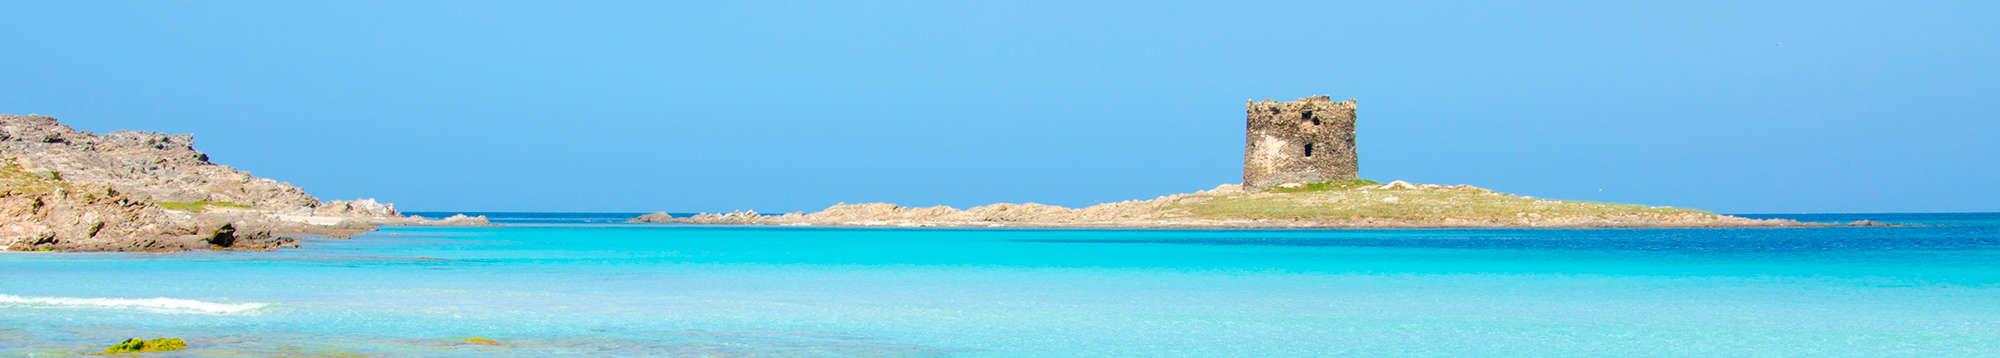 Week end e soggiorni in Sardegna